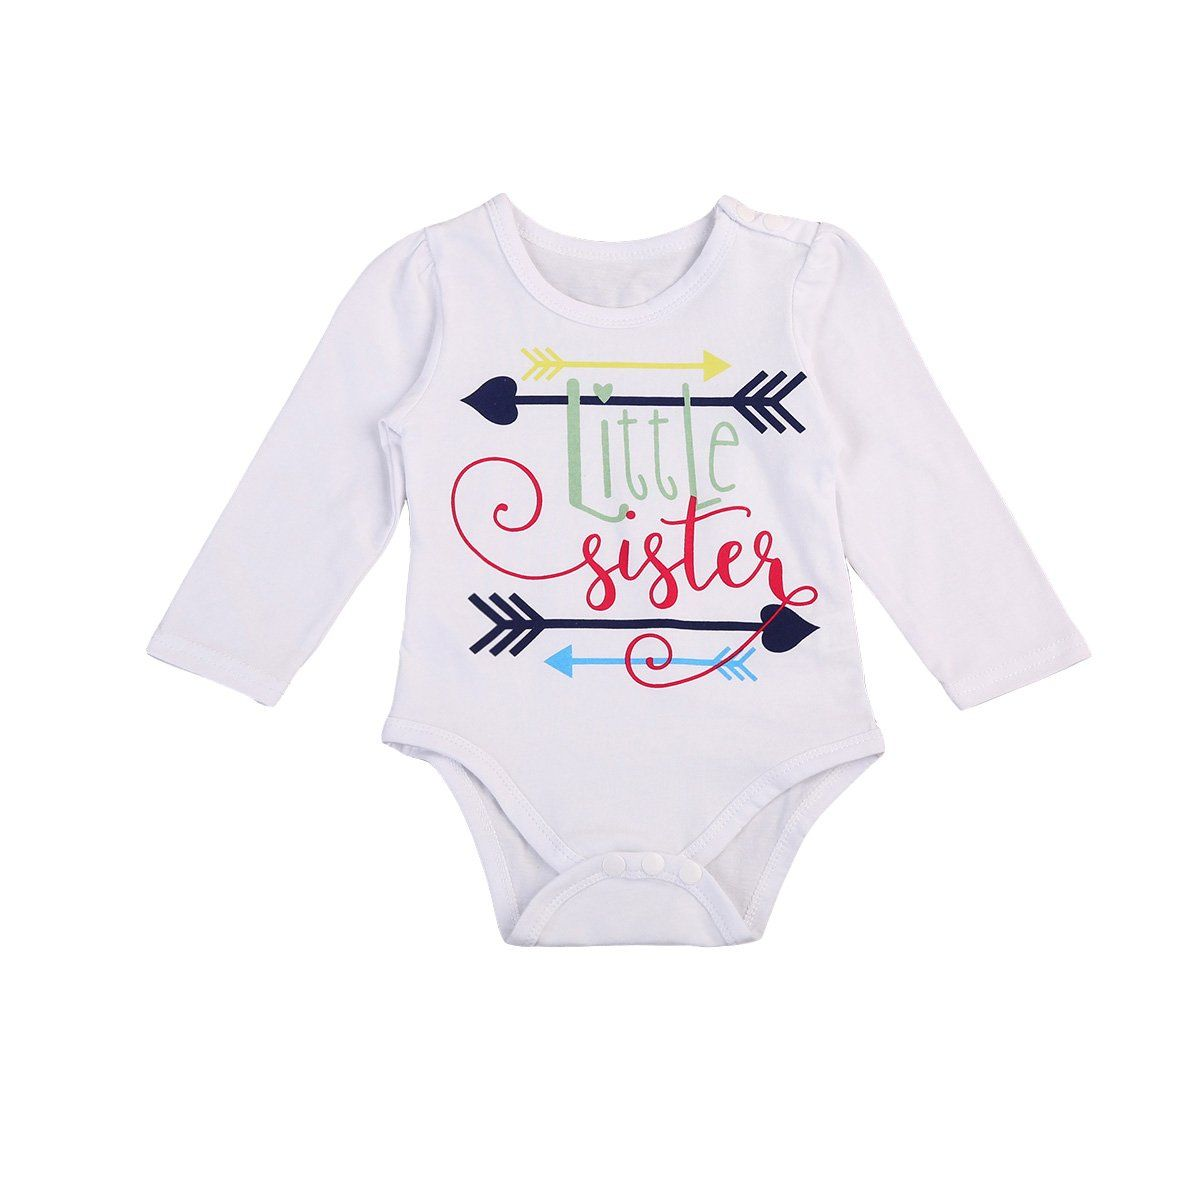 415cd4892 Toddler Baby Girl Little Sister Arrows Print Long Sleeve T-shirt ...